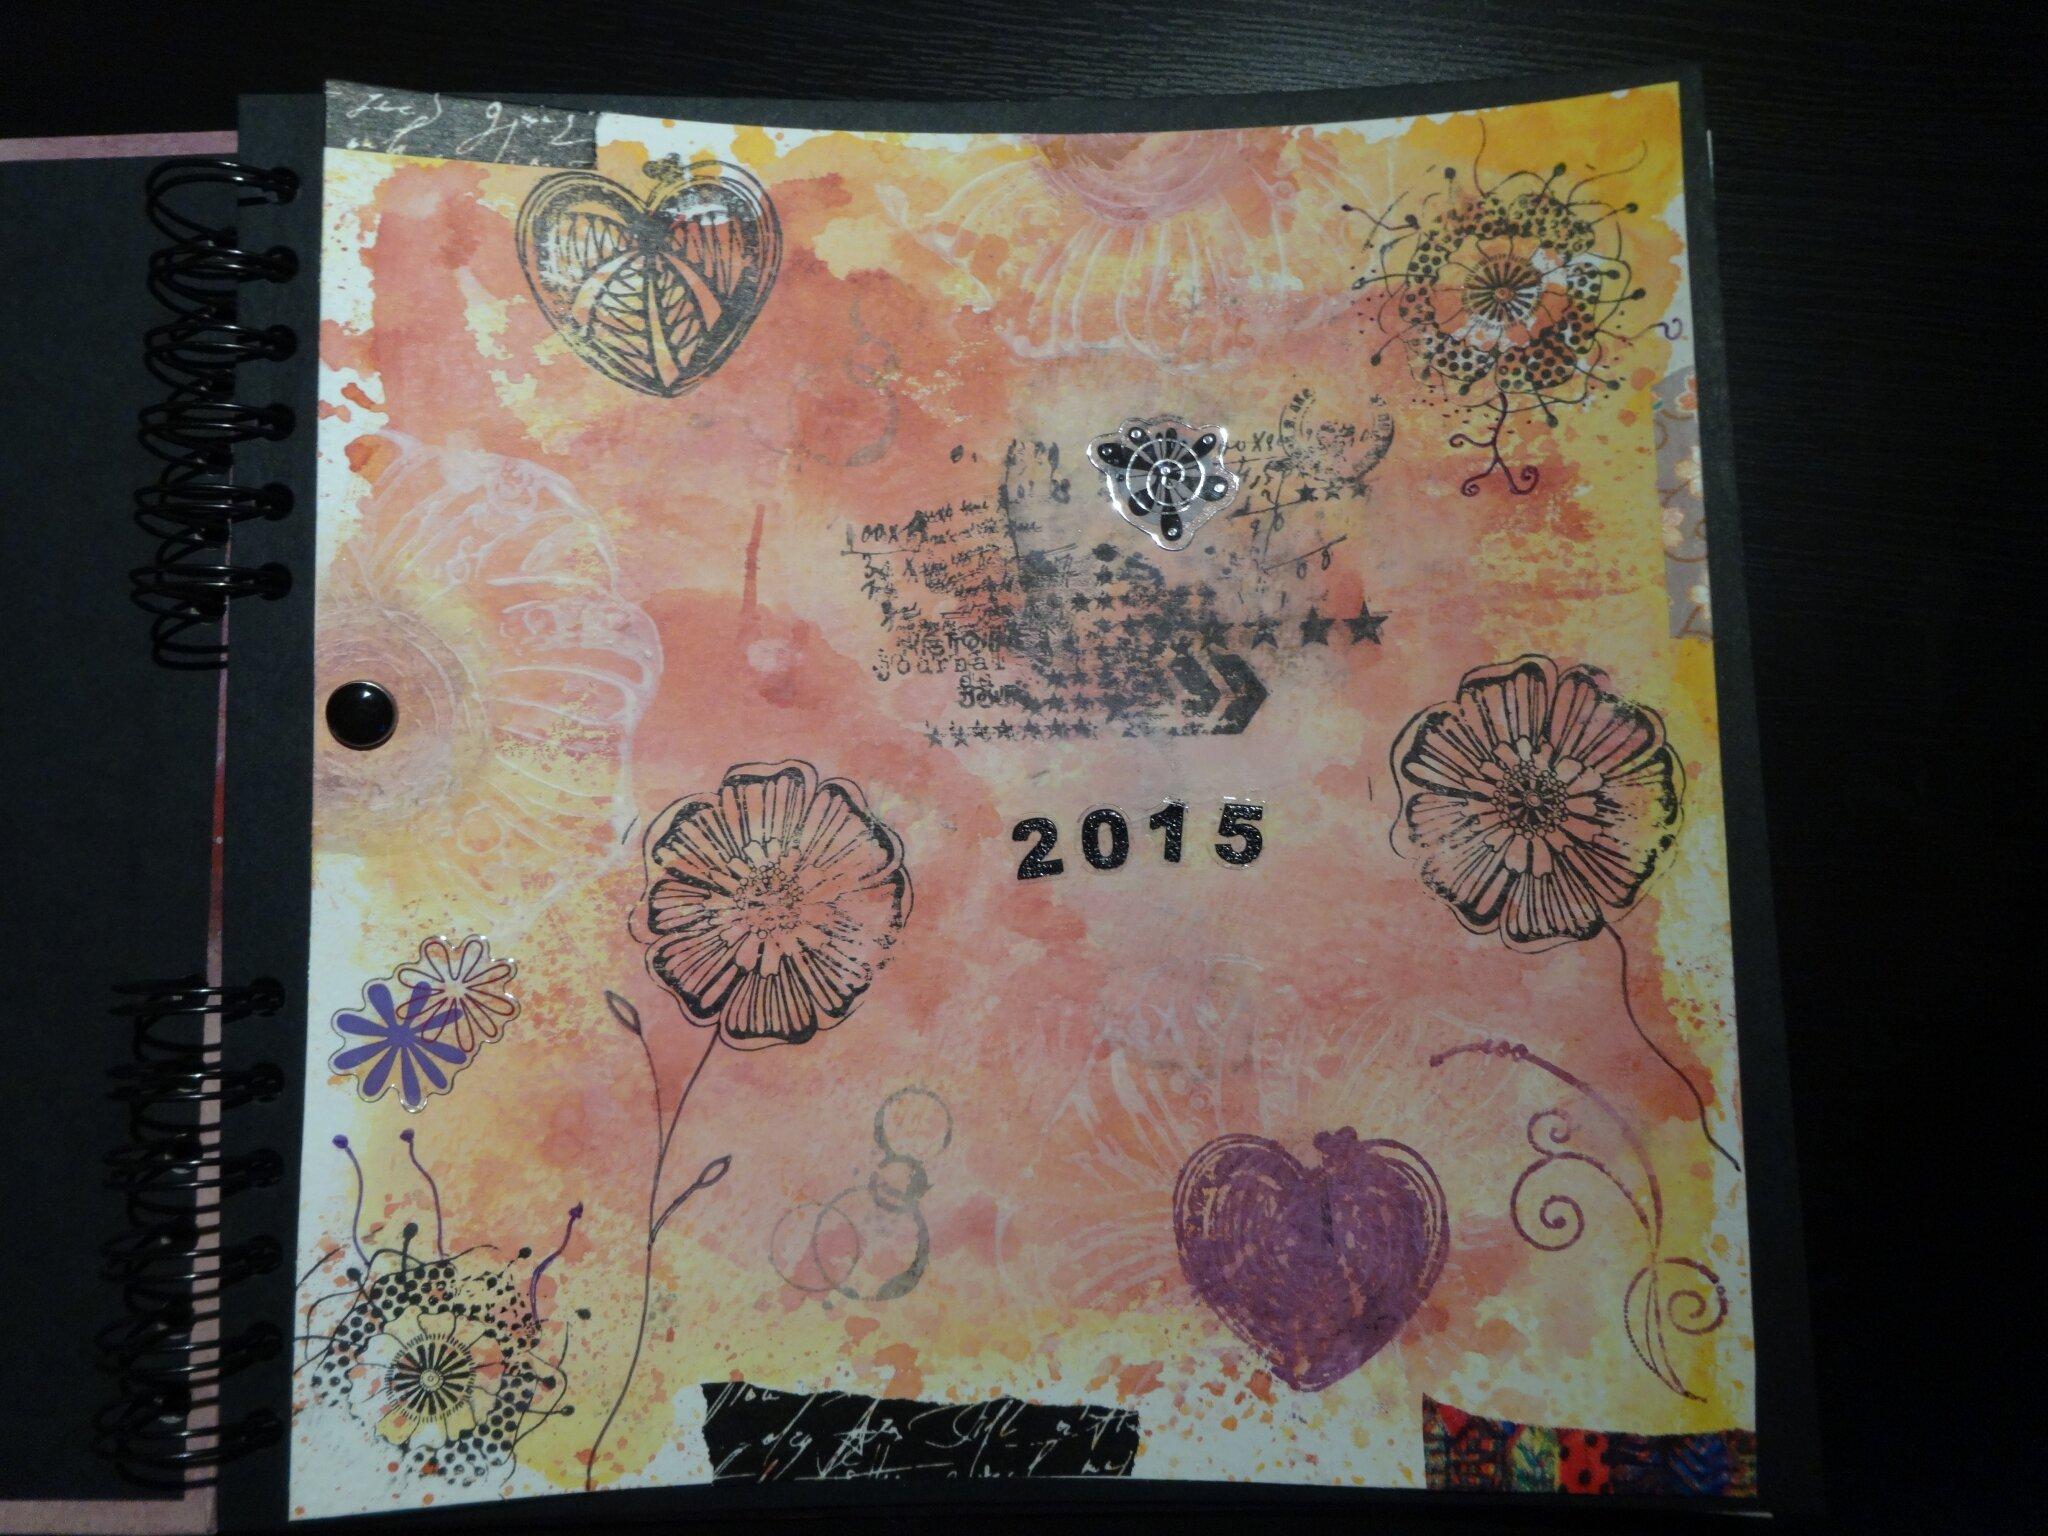 Positiv'journal